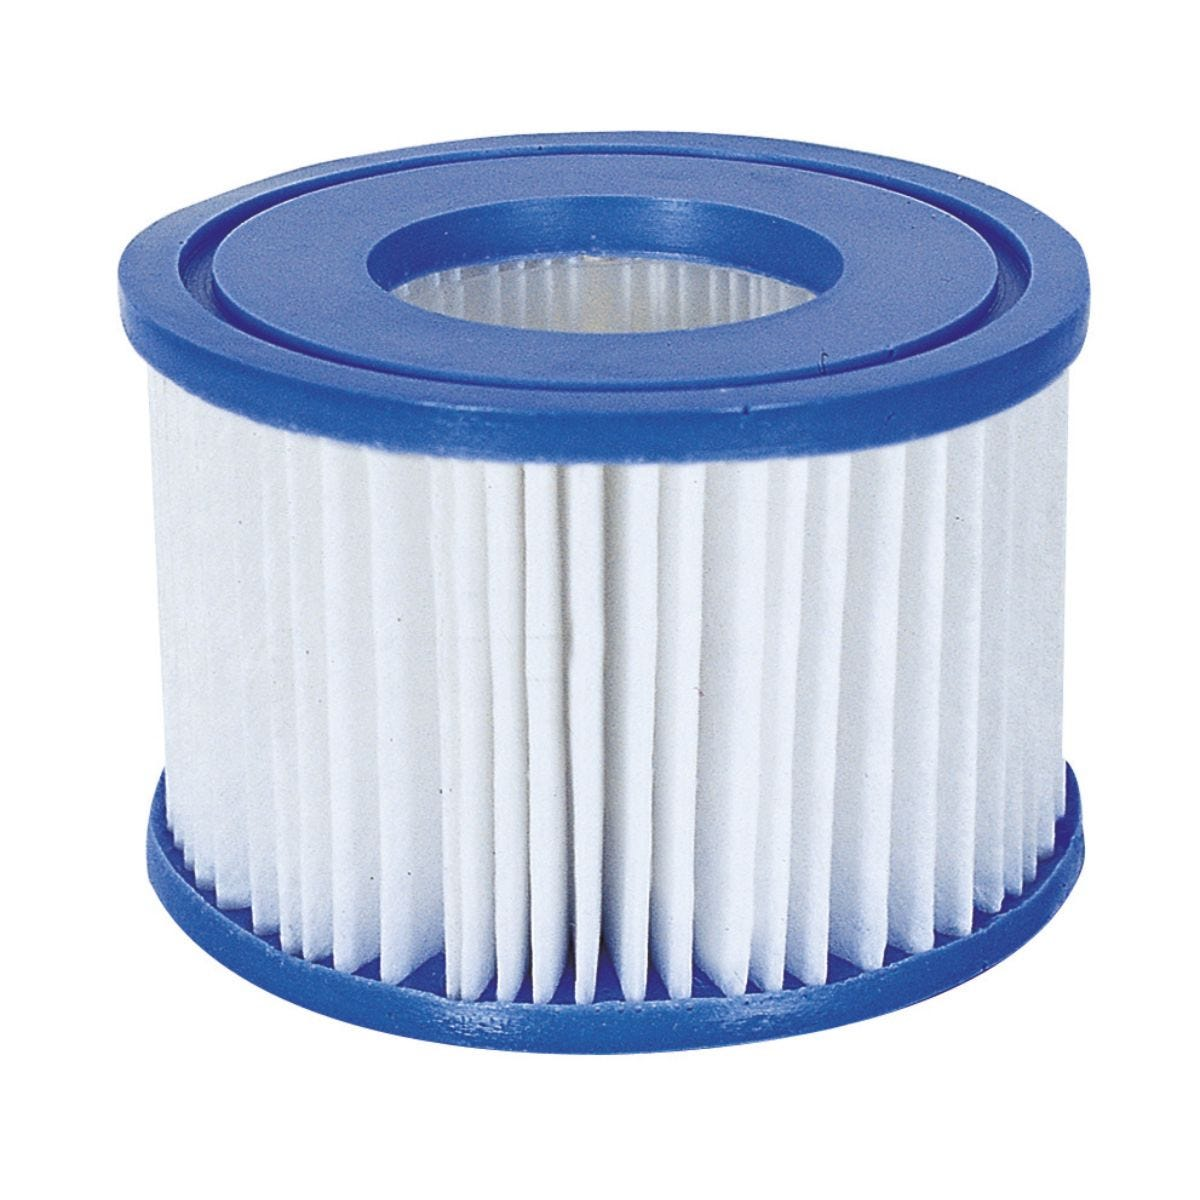 Lay-Z-Spa Filter Cartridge (IV)